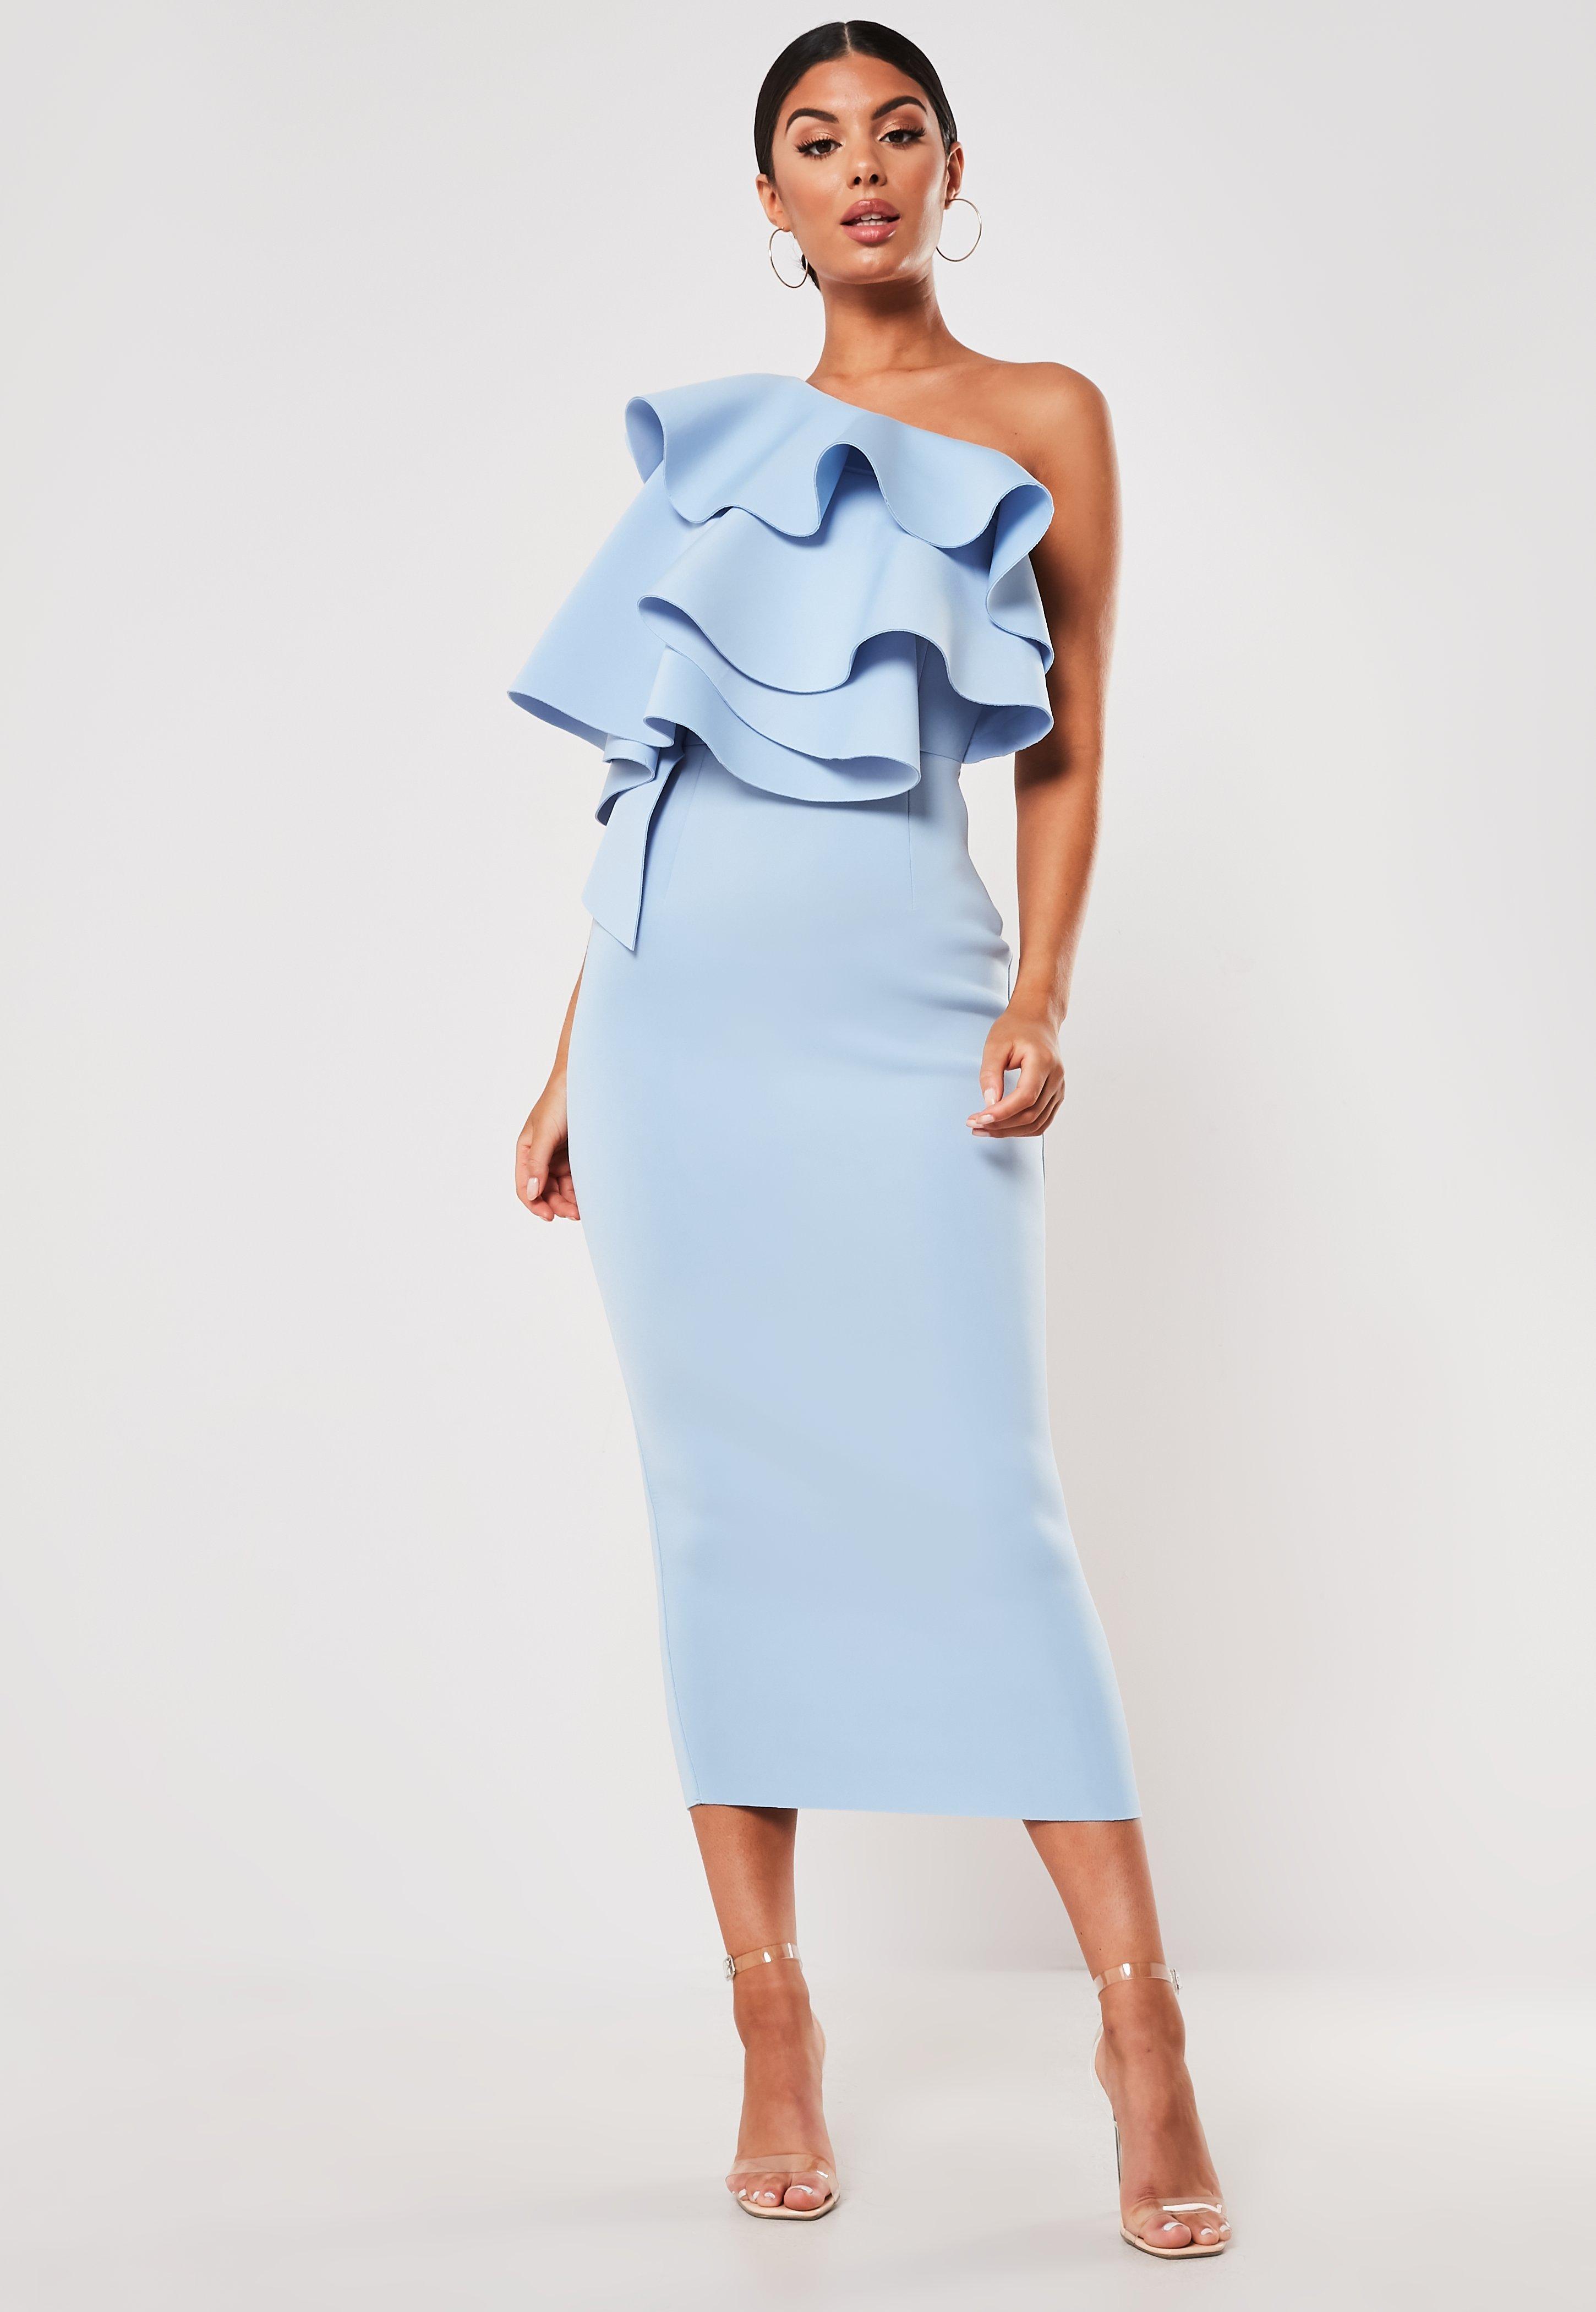 b7647236f07 Blue Ruffle One Shoulder Scuba Midi Dress